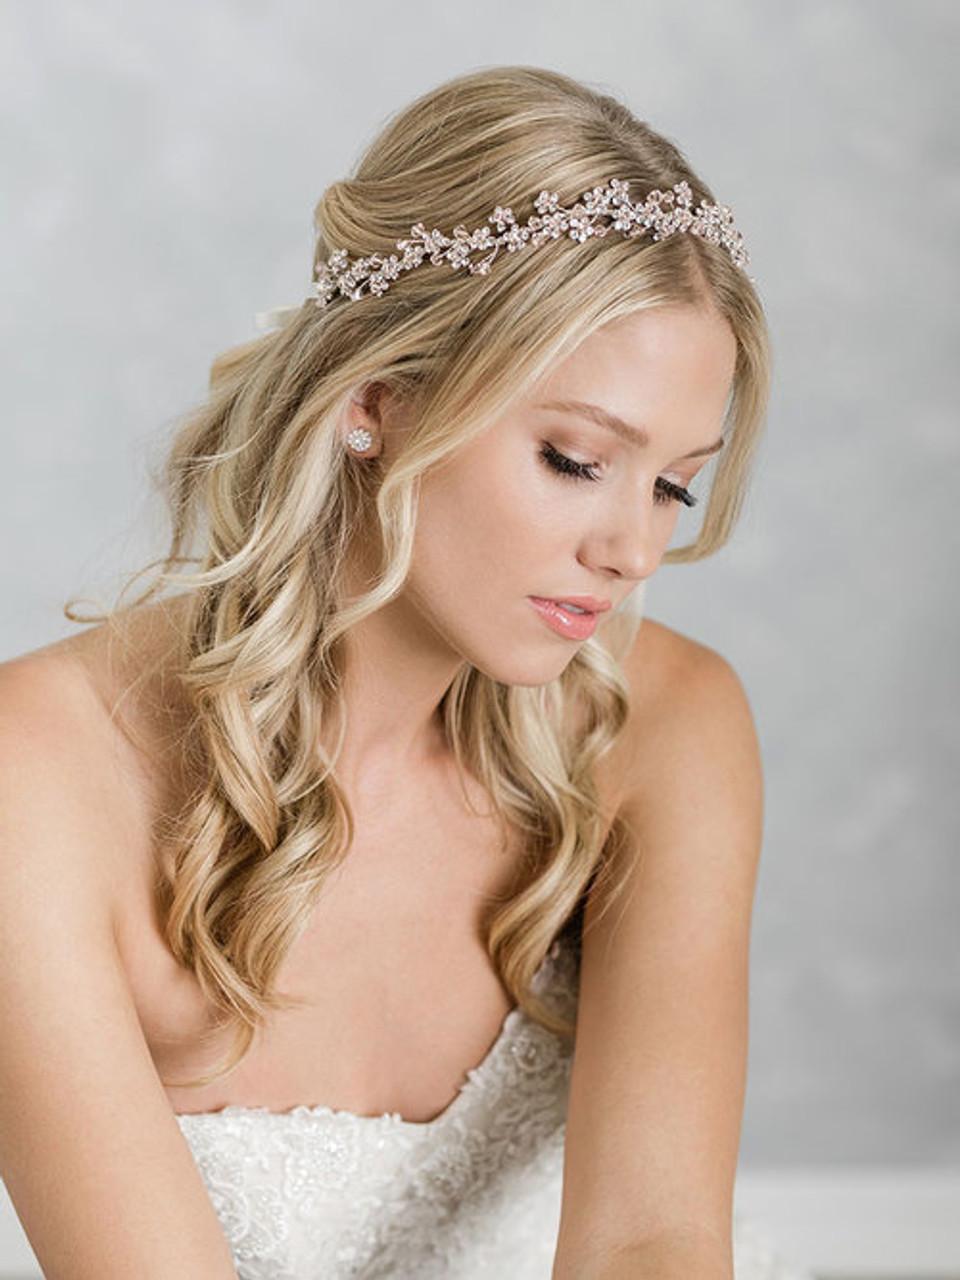 Bel Aire Bridal 6924 Garland with Swarovski crystal flowers